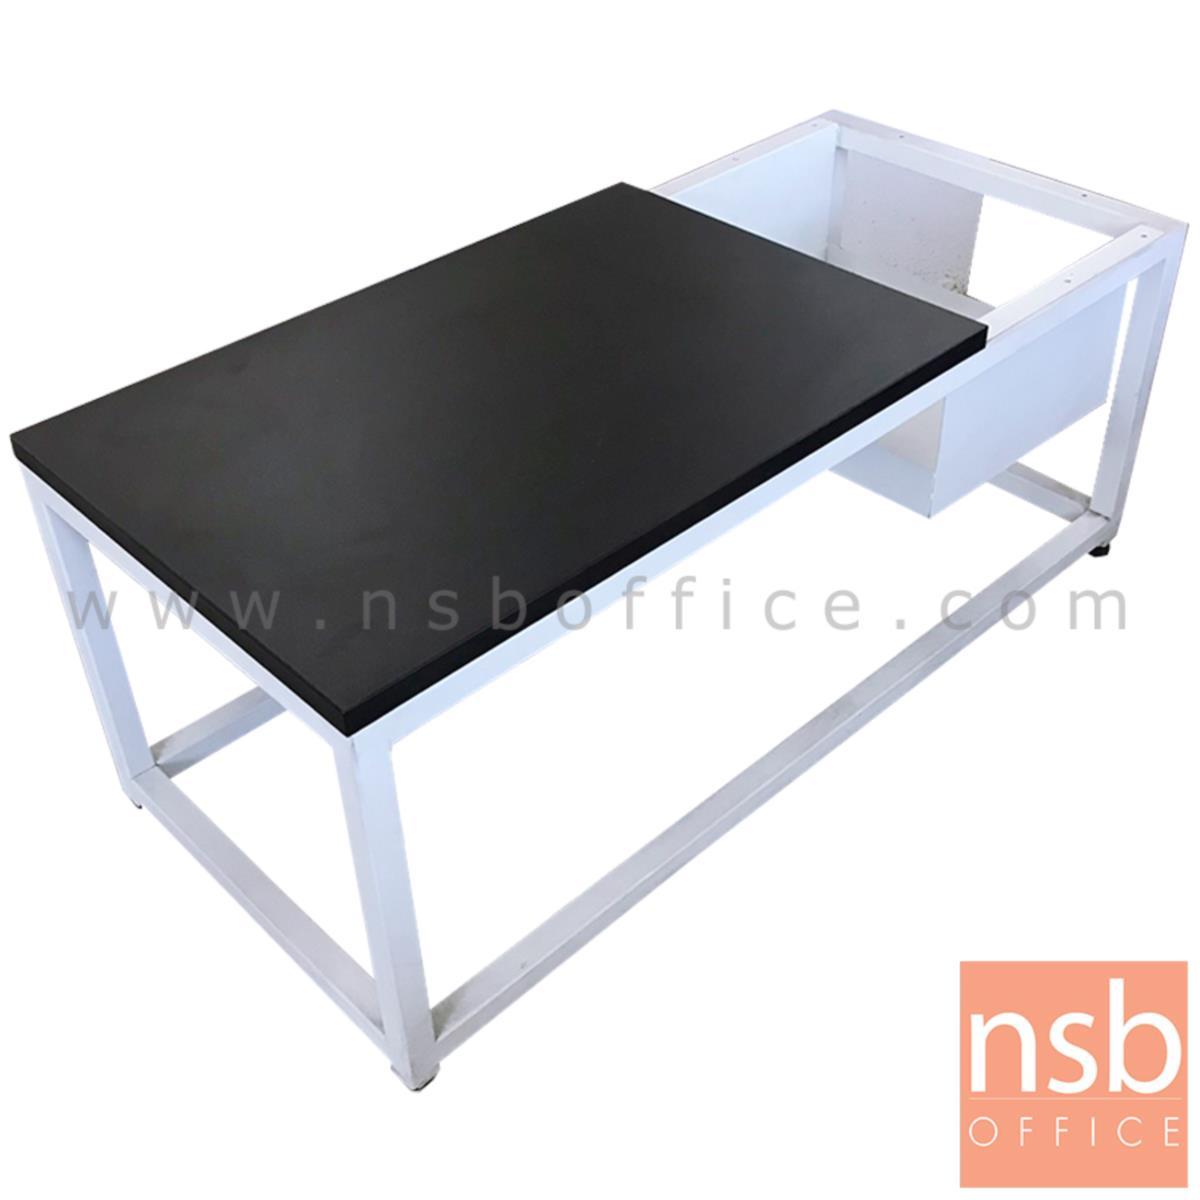 L01A141:โต๊ะเหลี่ยมโมเดิร์นไม้  ขนาด 90W*38H cm. ขาเหล็ก